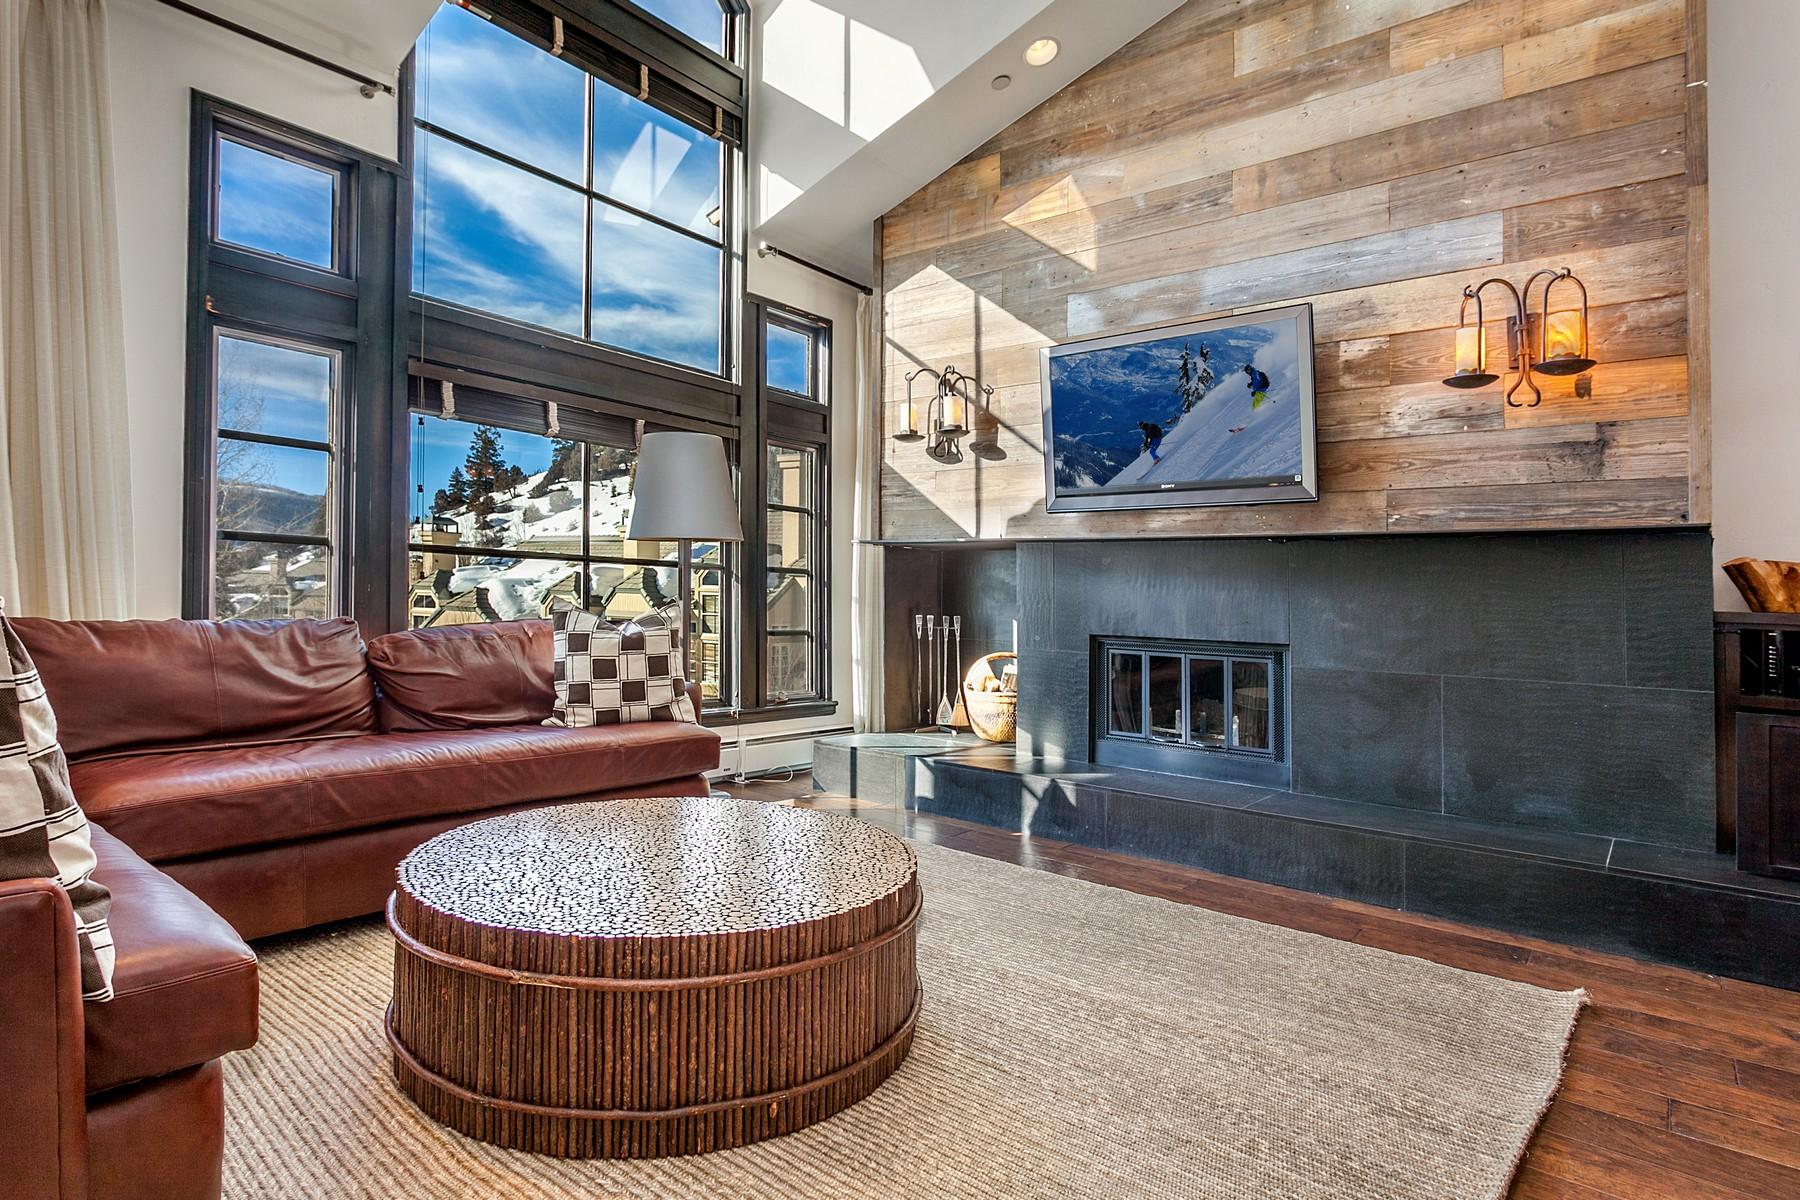 townhouses για την Πώληση στο Ski-in / Ski-out location with Mountain Views 380 Offerson Road #L3, Beaver Creek, Κολοραντο 81620 Ηνωμένες Πολιτείες